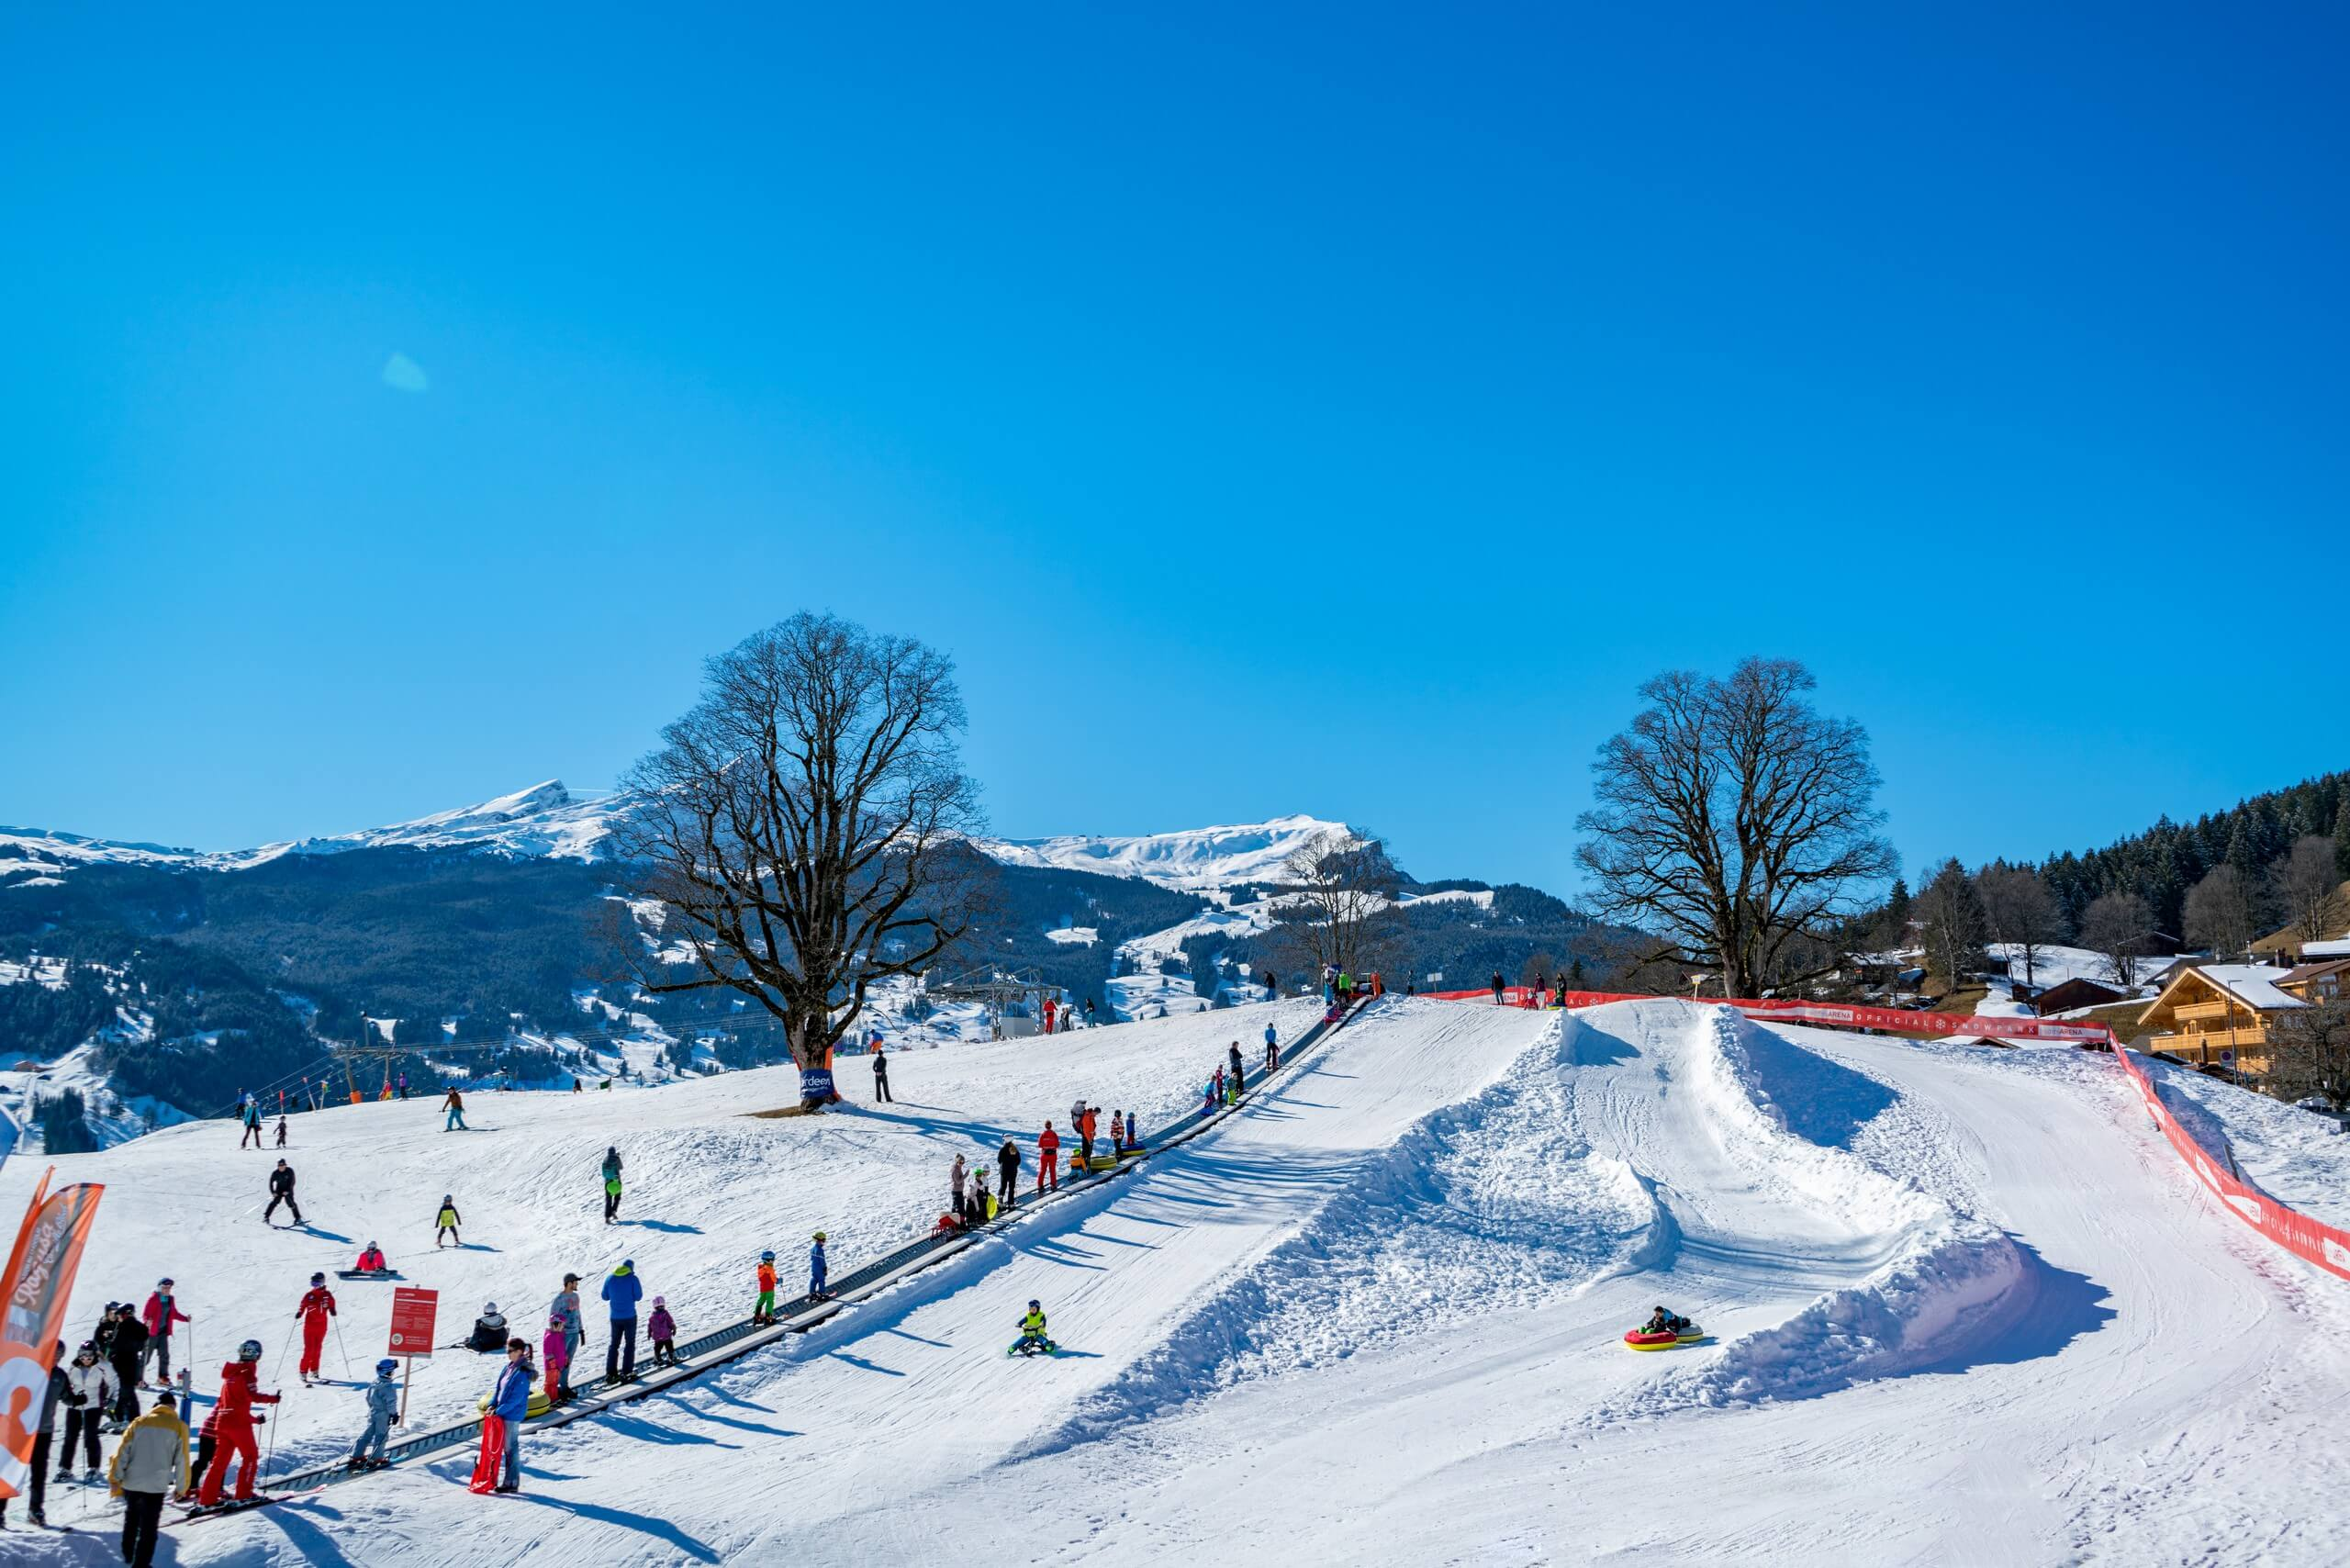 grindelwald-bodmi-winter-outdoor-interlaken-learning-to-ski-snowboard